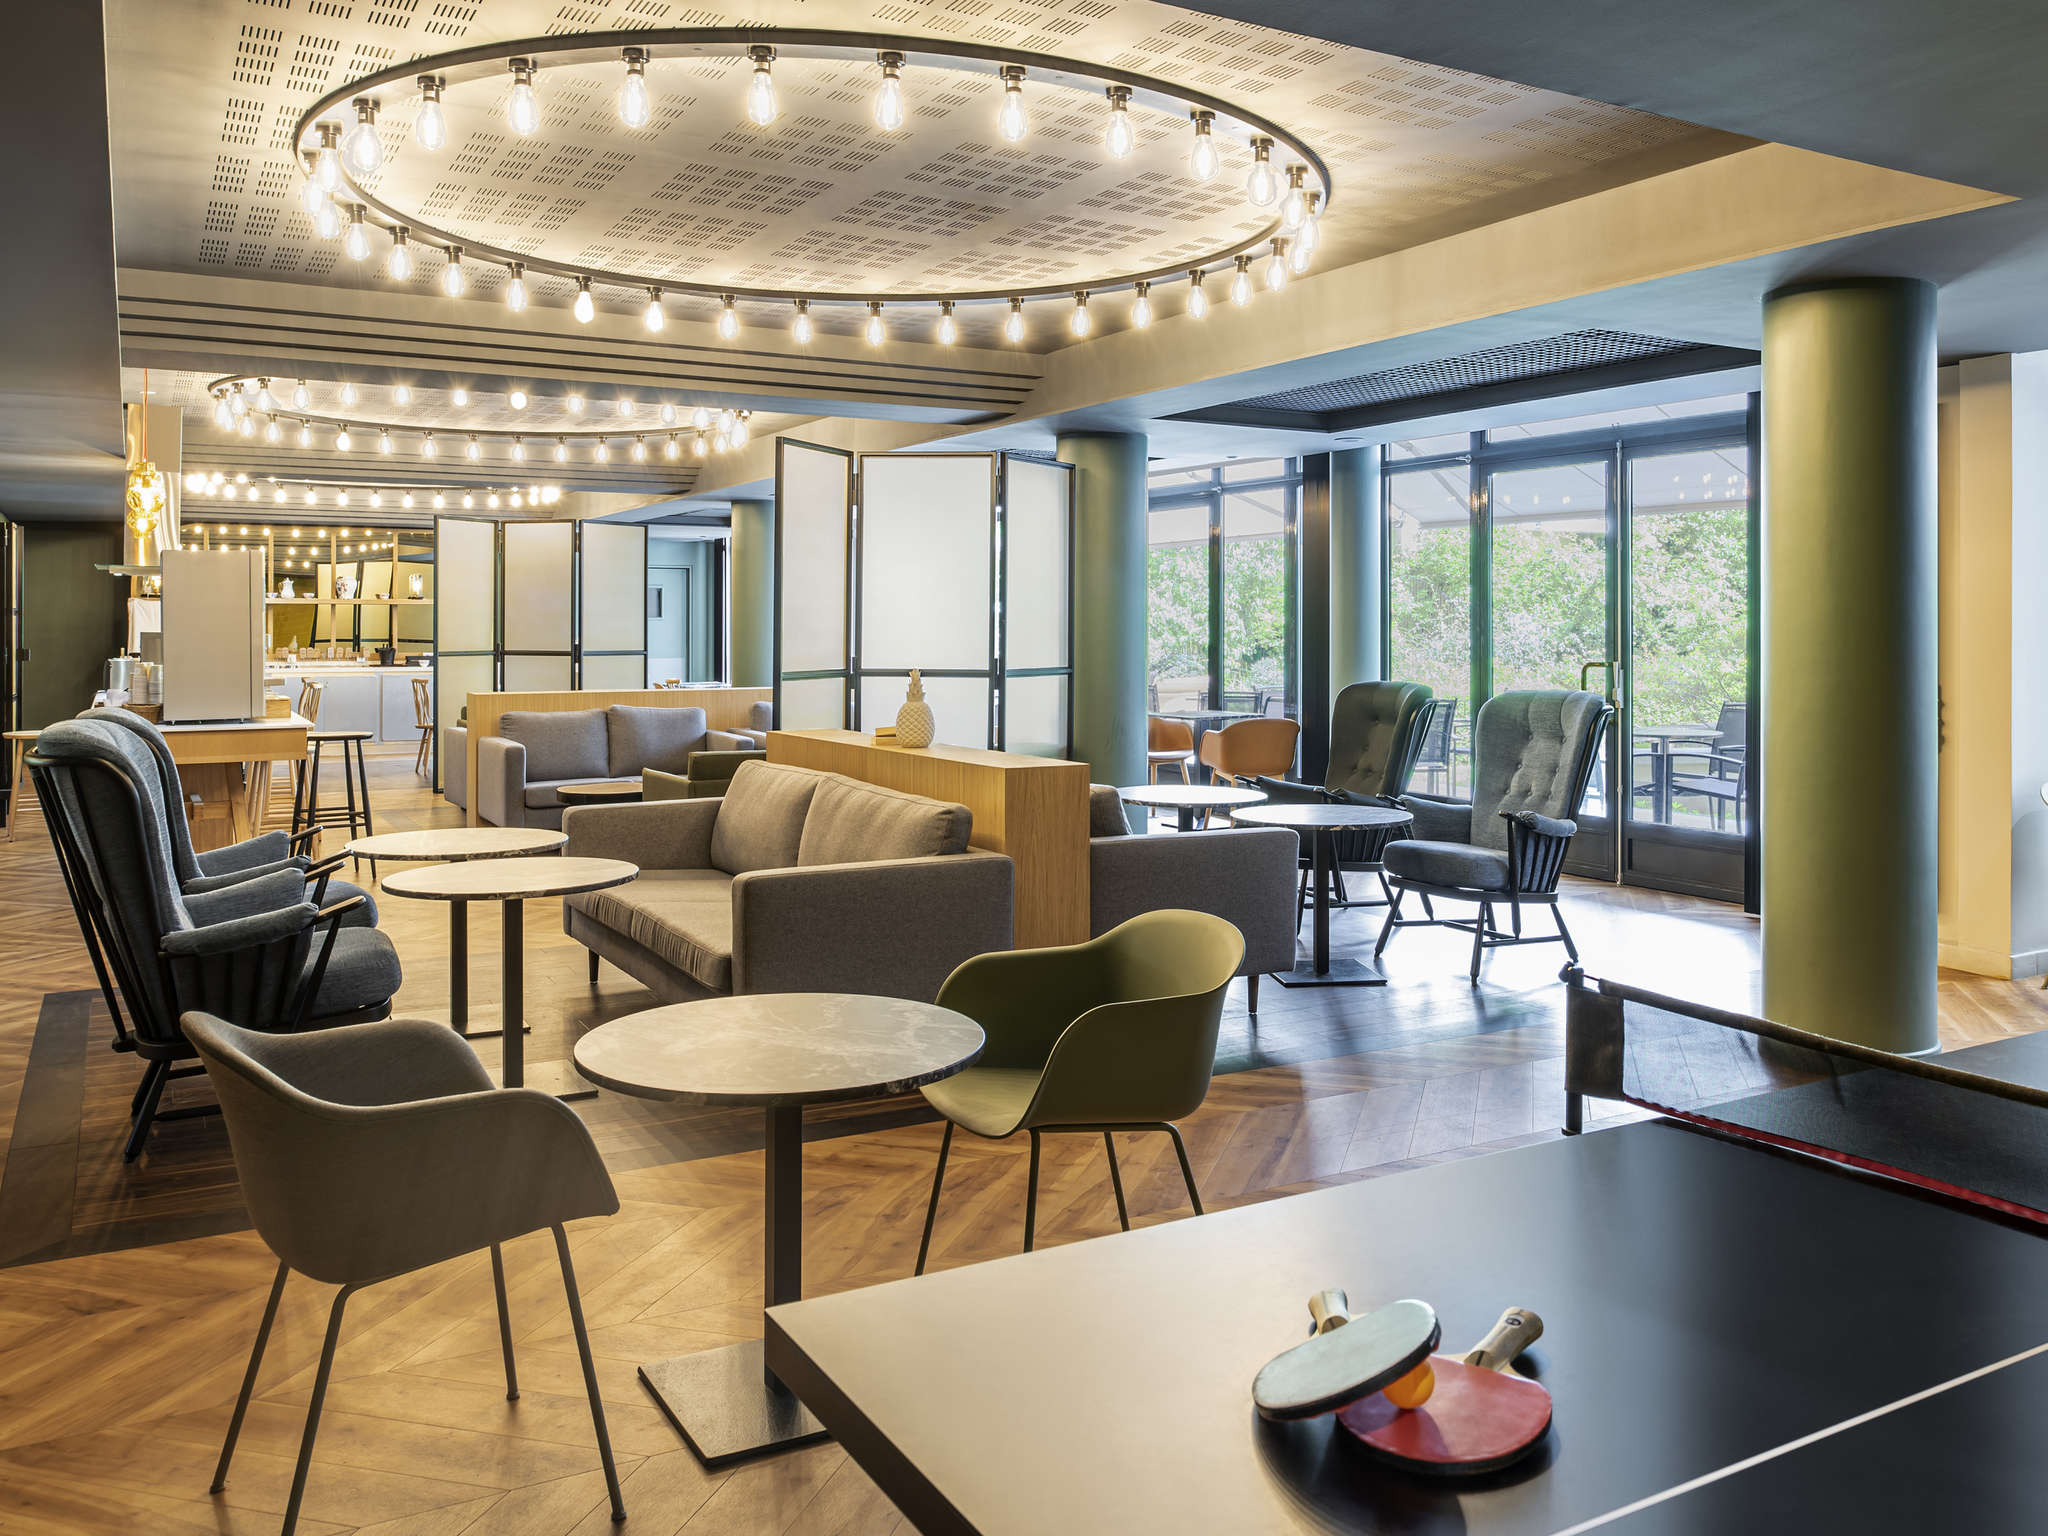 hotel in issy les moulineaux aparthotel adagio porte de versailles. Black Bedroom Furniture Sets. Home Design Ideas